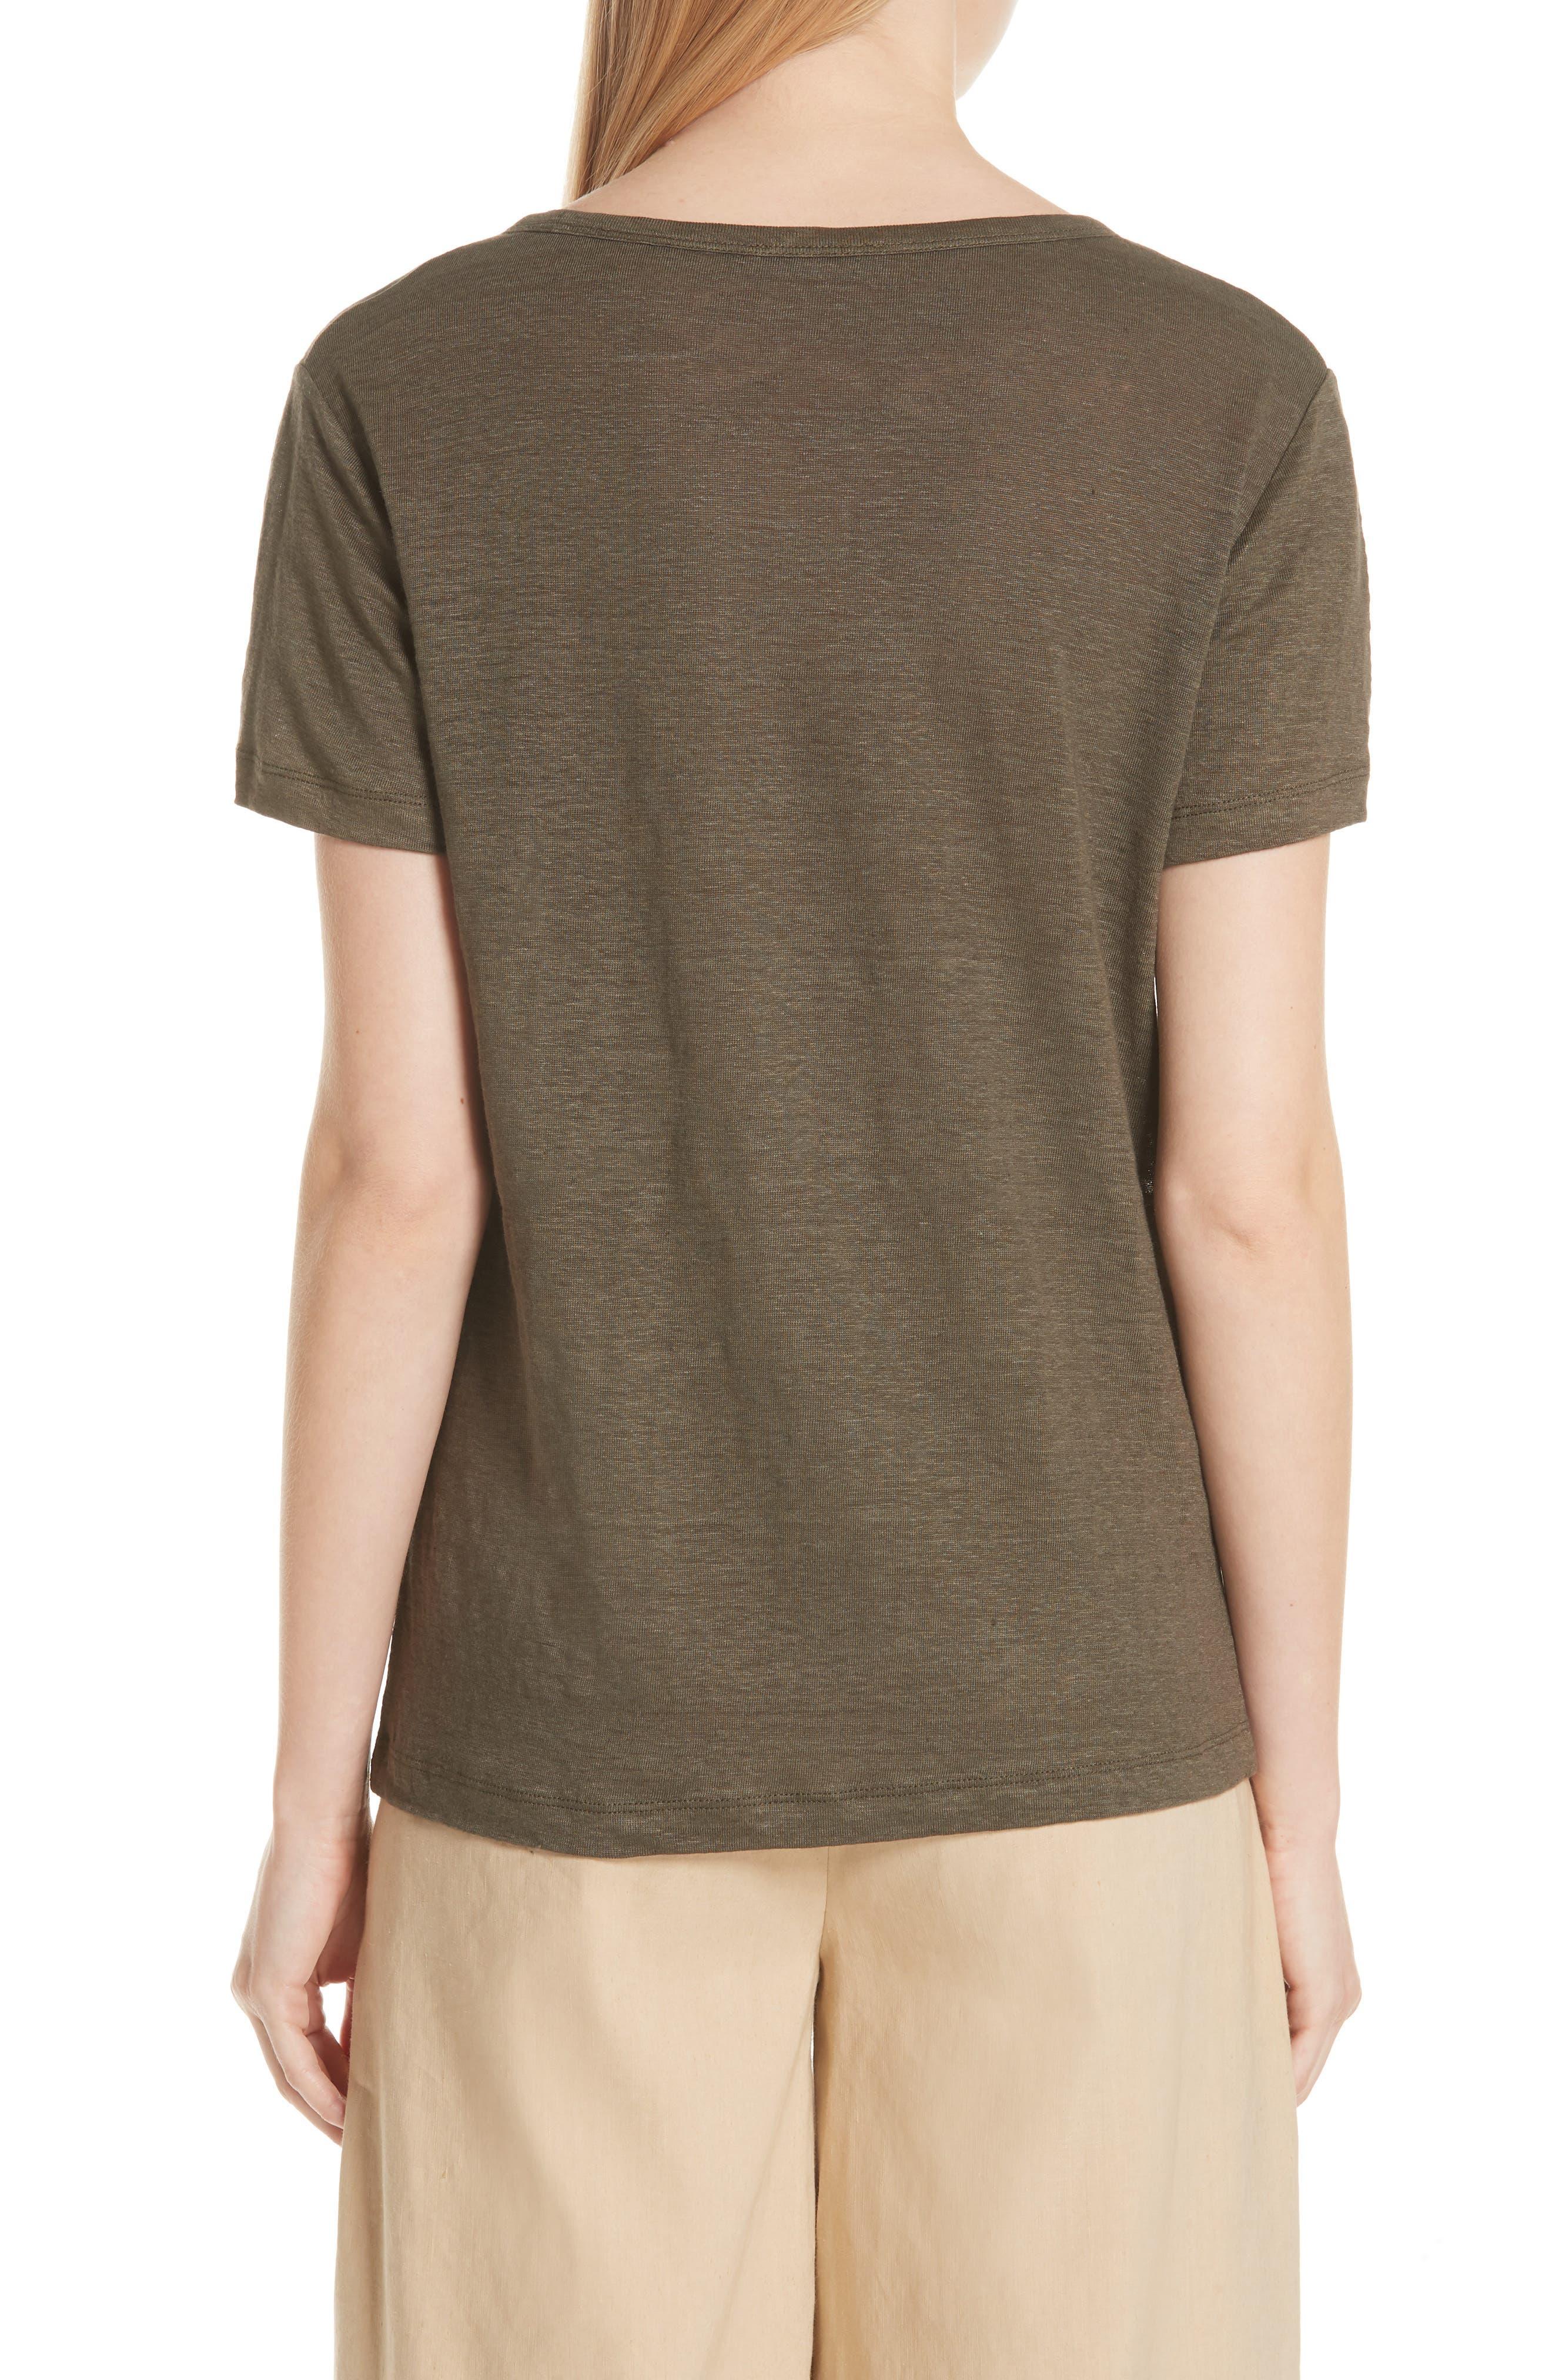 Alternate Image 2  - Vince Linen Short Sleeve Top